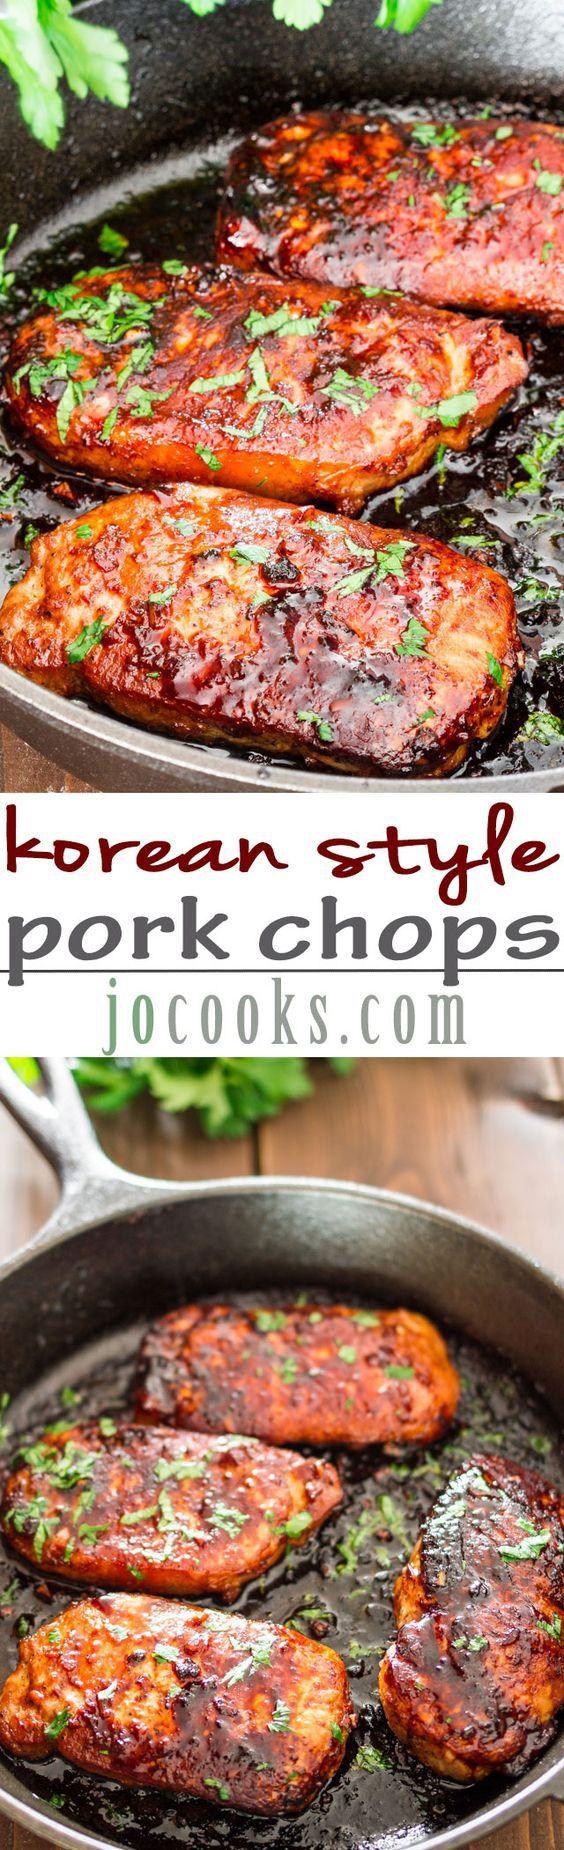 Pork chops cuban style recipe